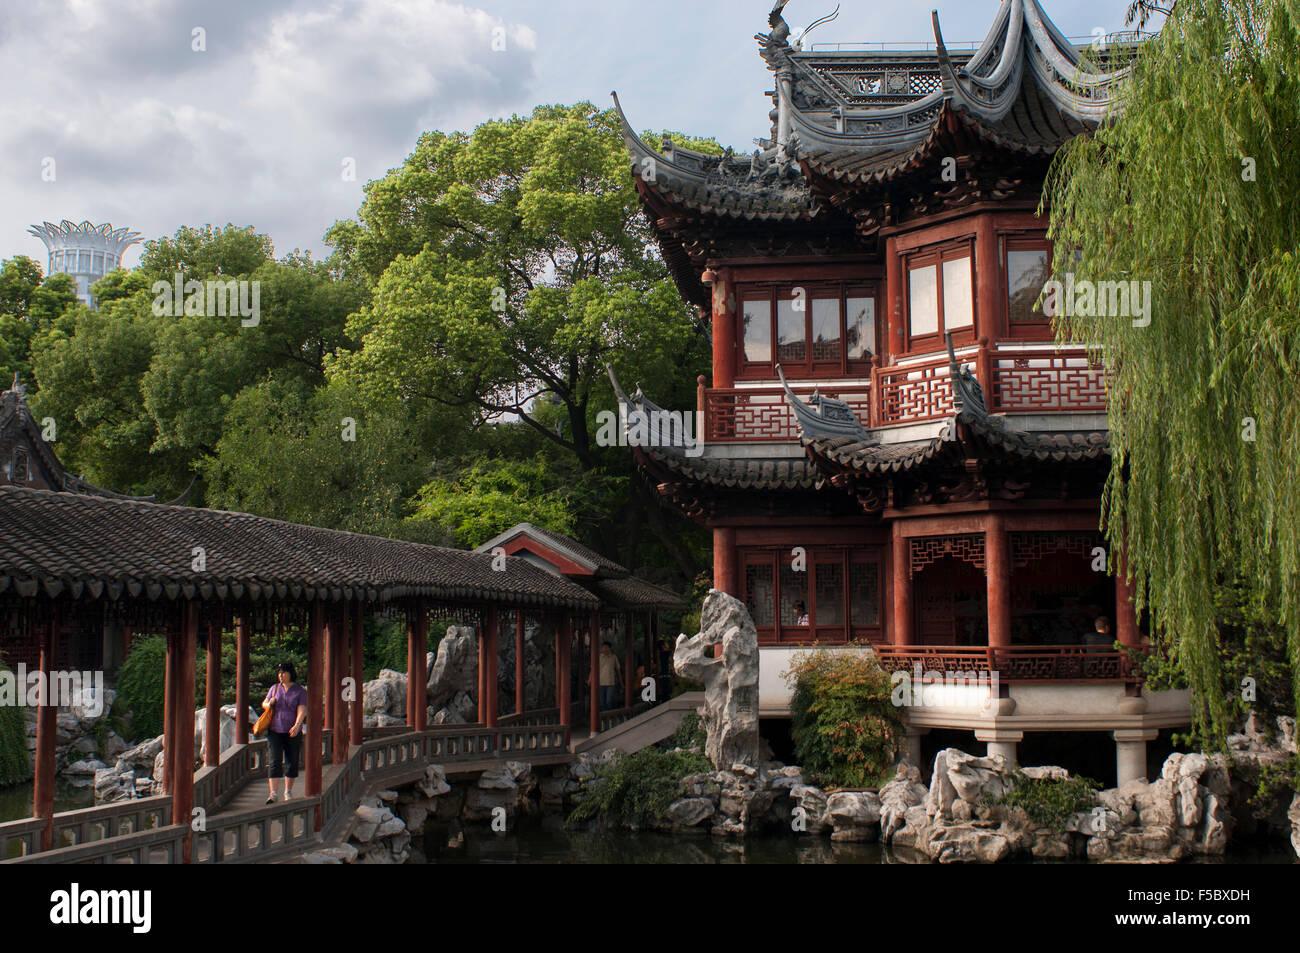 Yuyuan Or Yu Garden Jade Garden Old Town Shanghai China